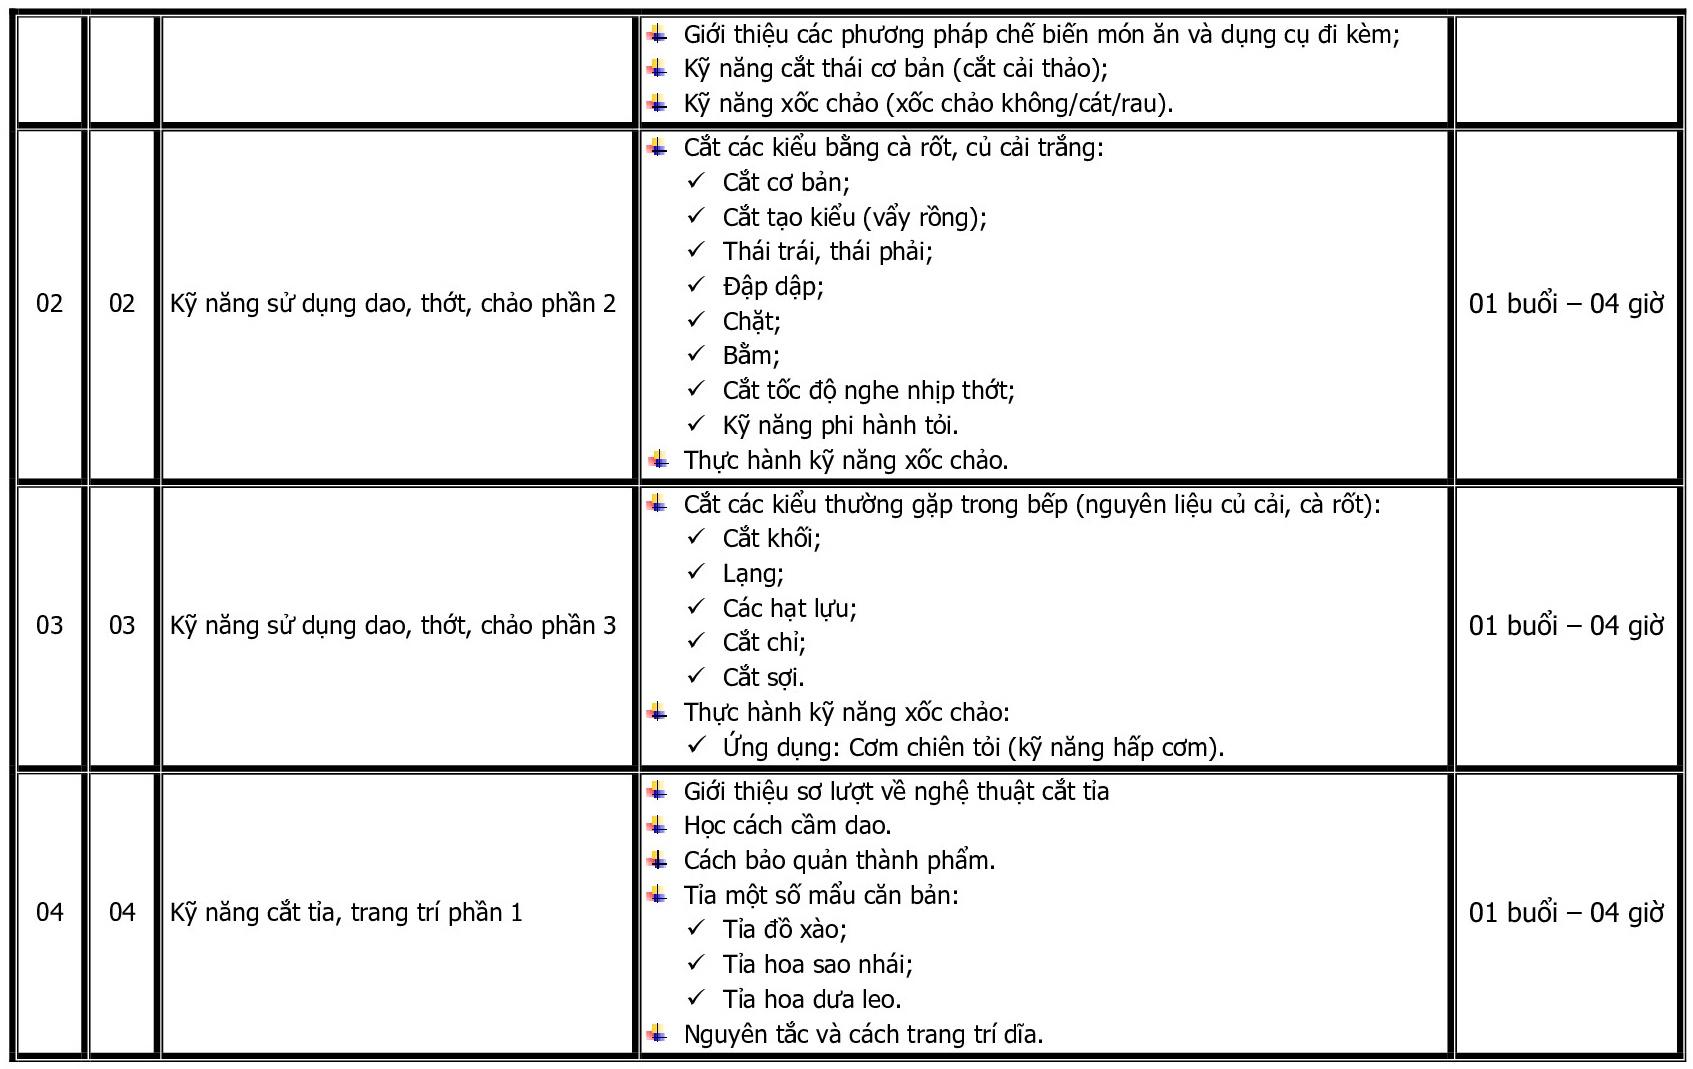 CT DAO TAO THUC HANH BAC TRUNG CAP_p005